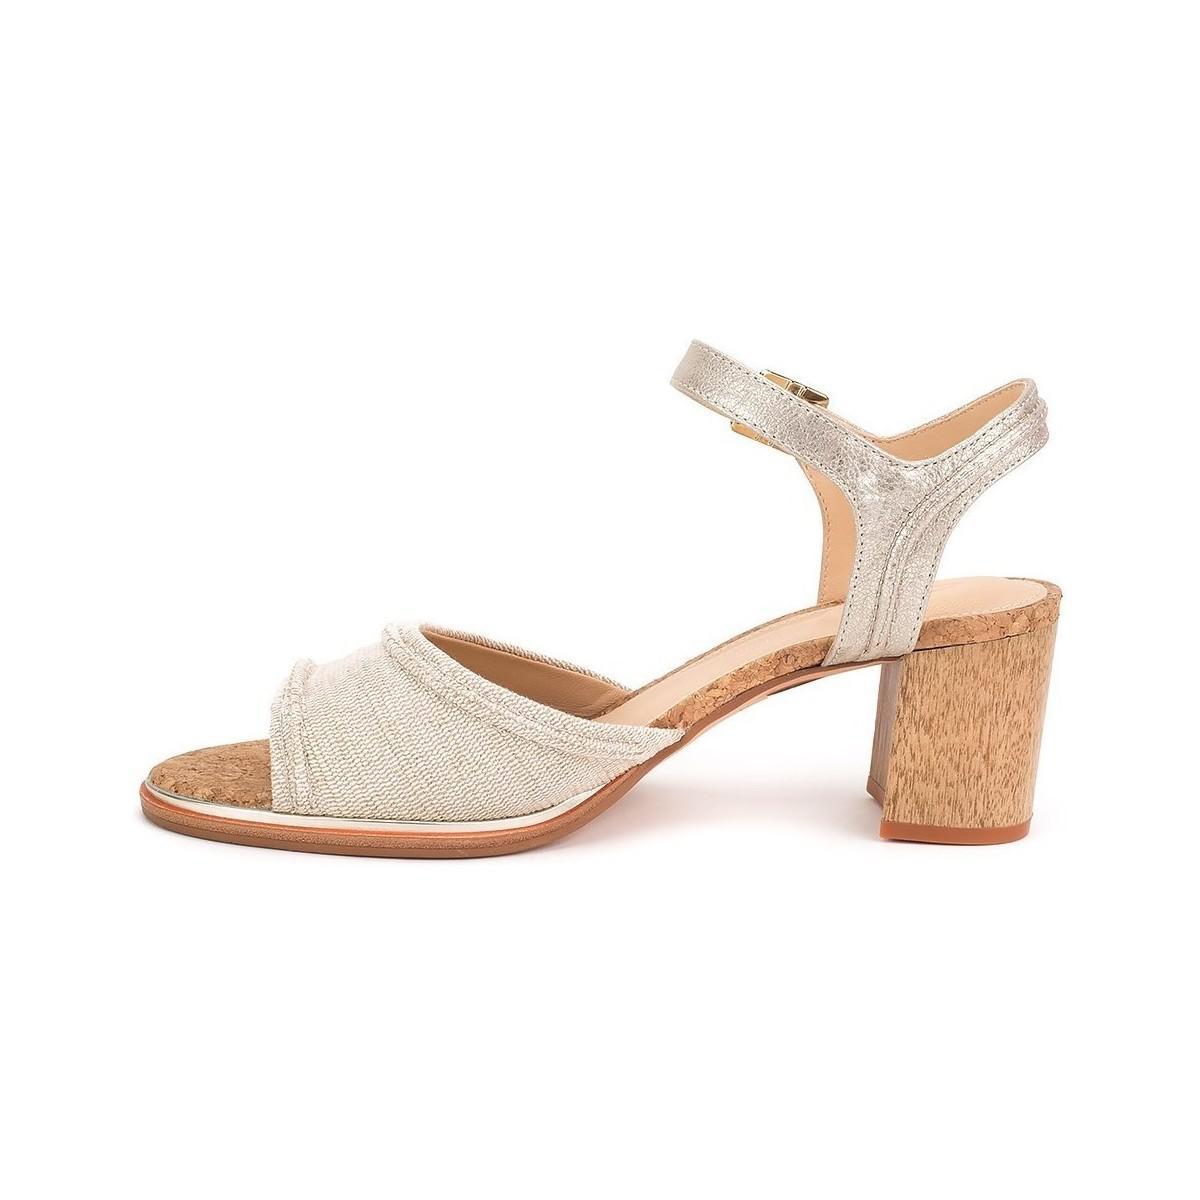 36058d0f9b92 Clarks Ellis Clara Women s Sandals In Beige in Natural - Lyst